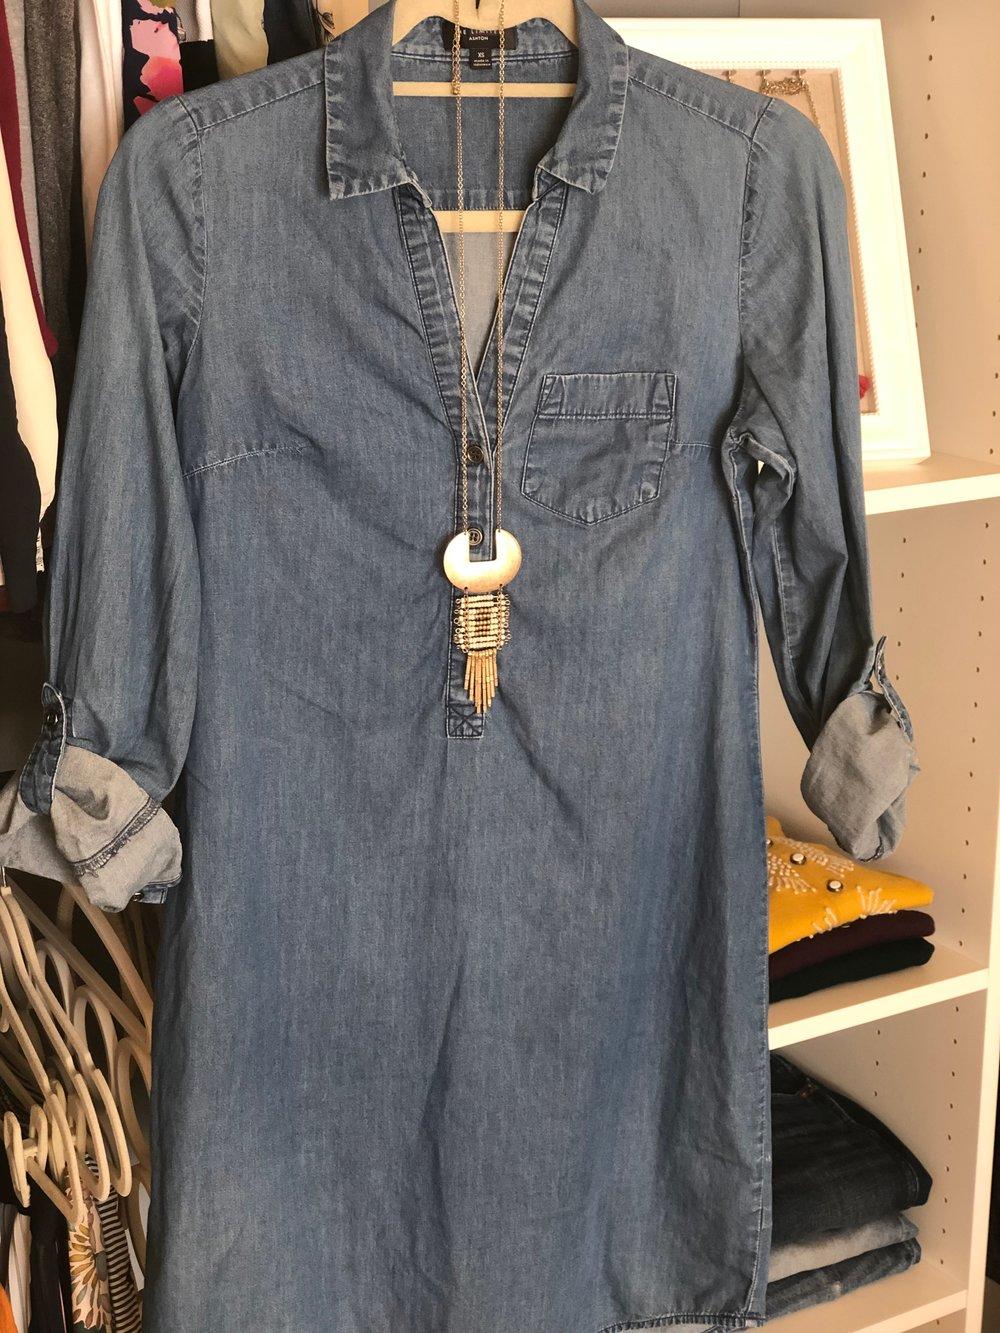 Six Ways to Style a Vest - Style Shop Denver